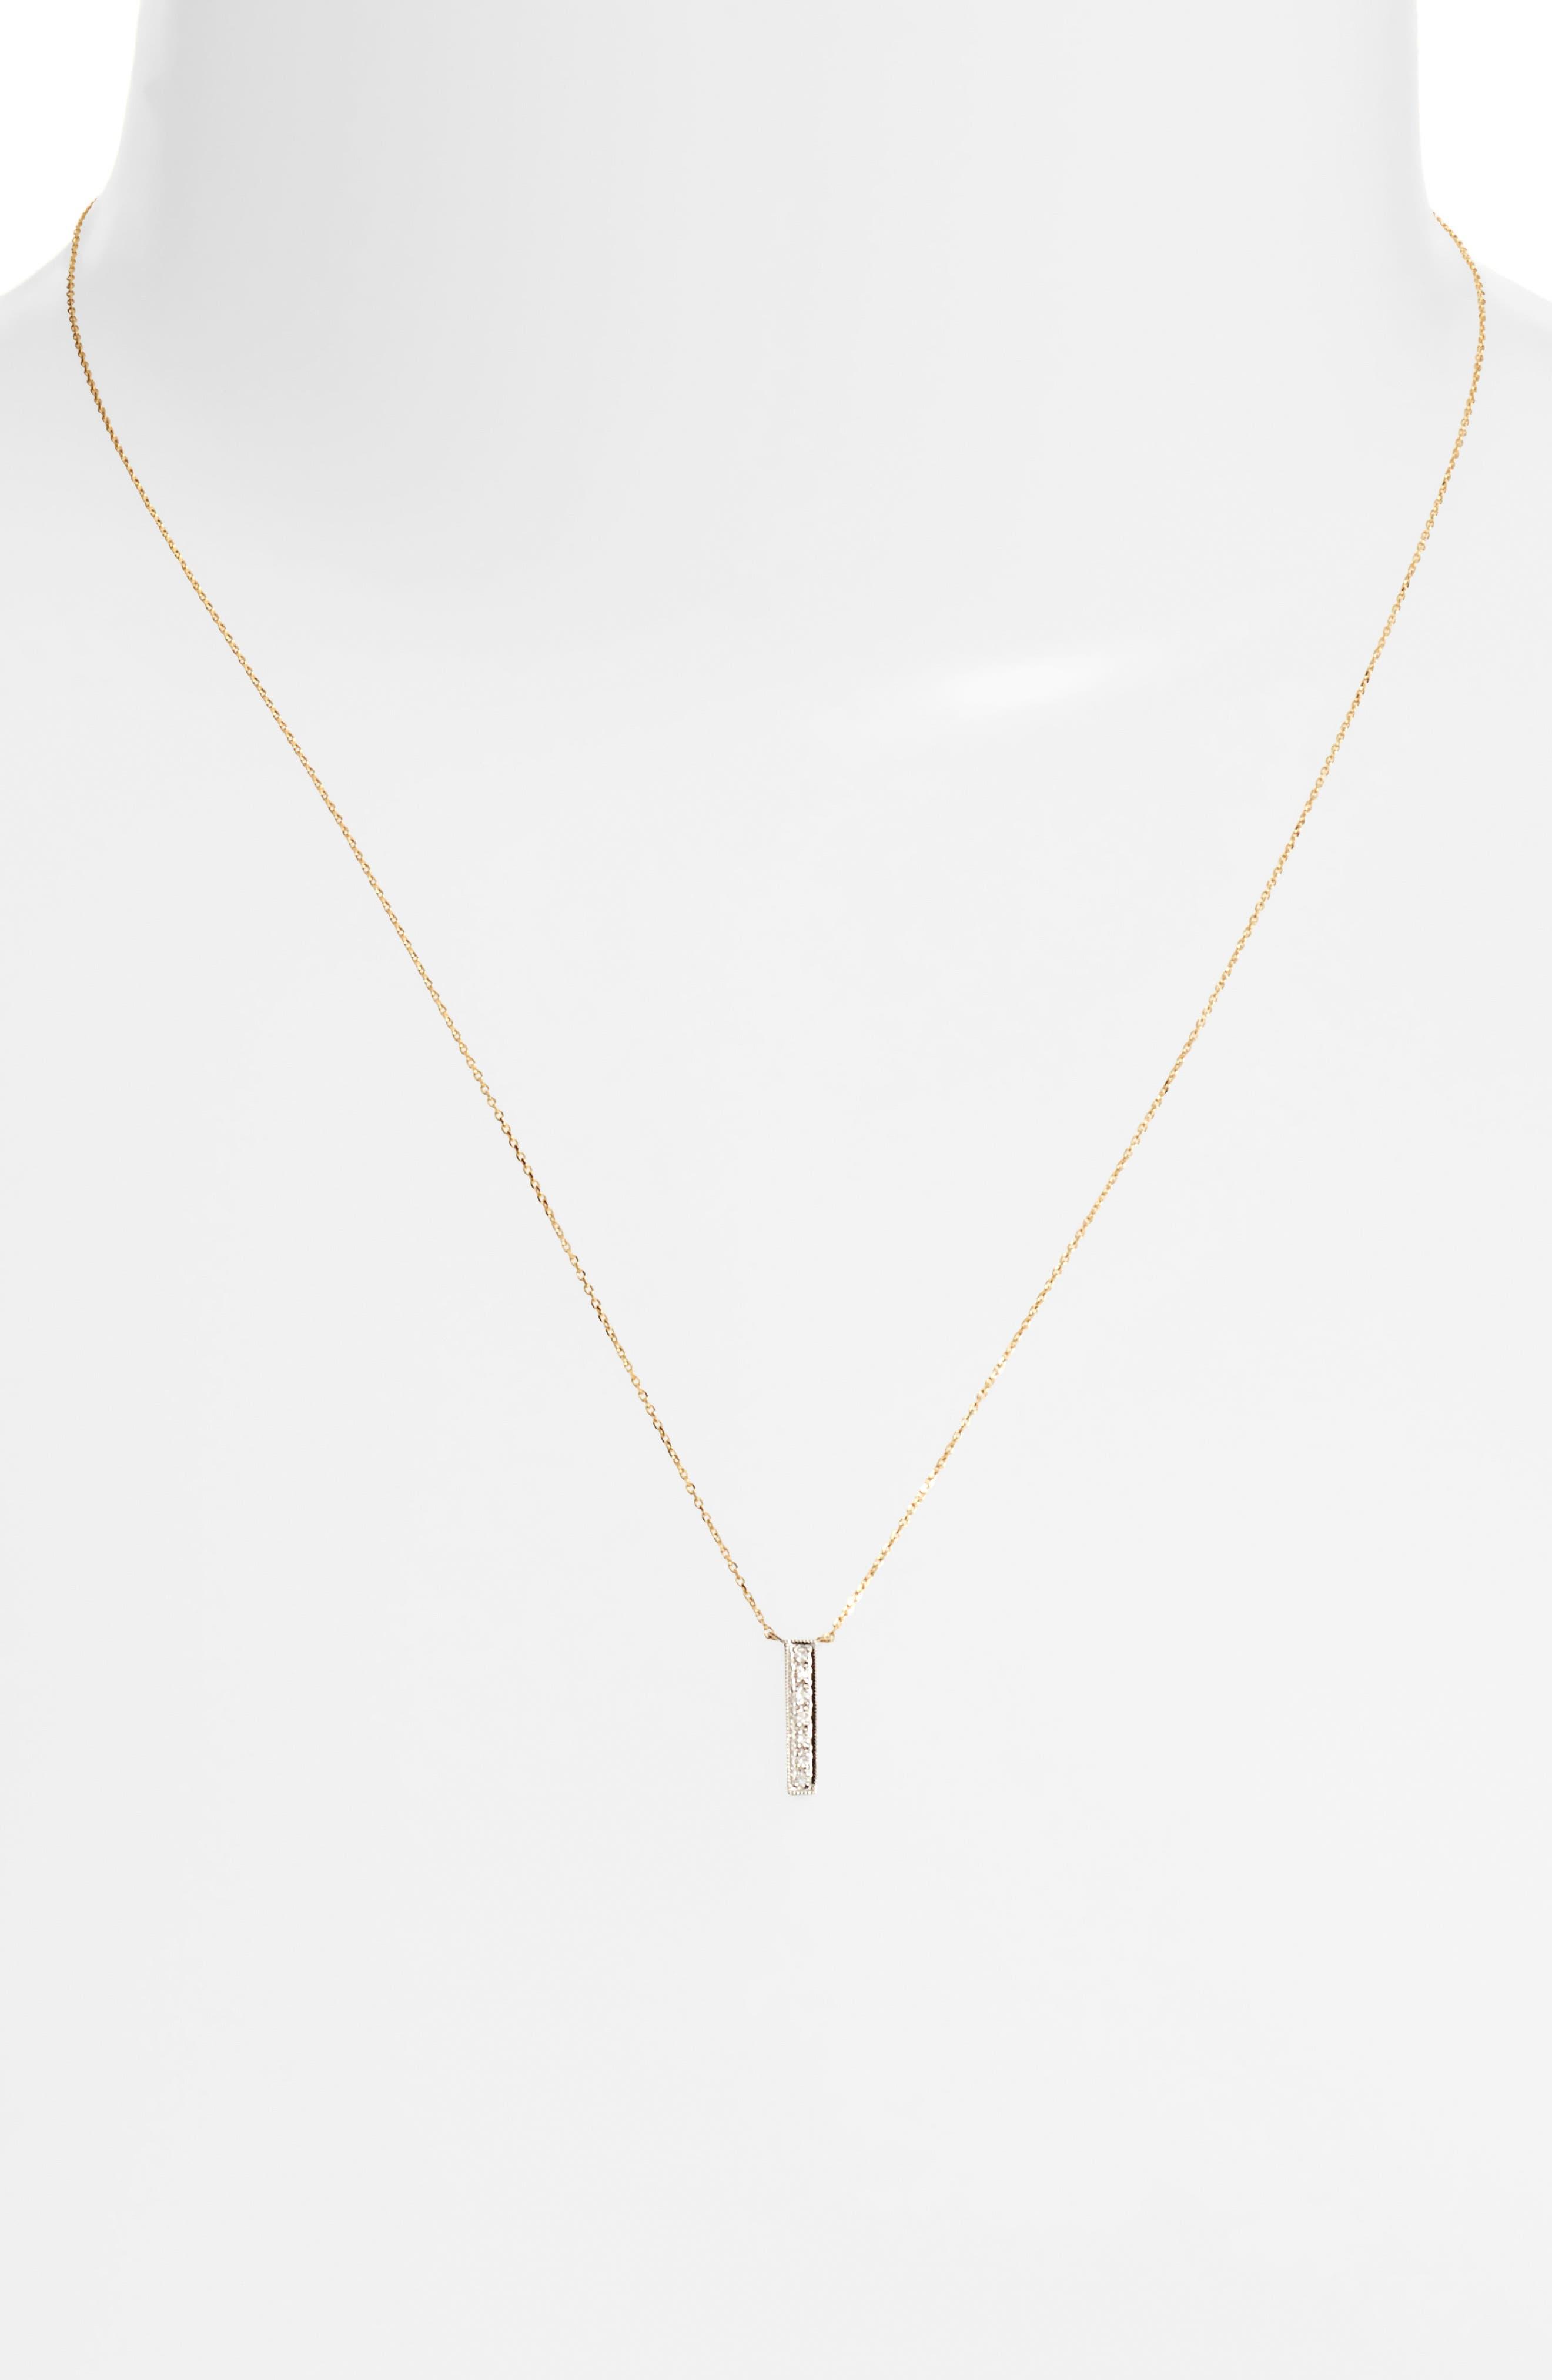 Sylvie Rose Vertical Bar Diamond Pendant Necklace,                             Alternate thumbnail 3, color,                             YELLOW GOLD